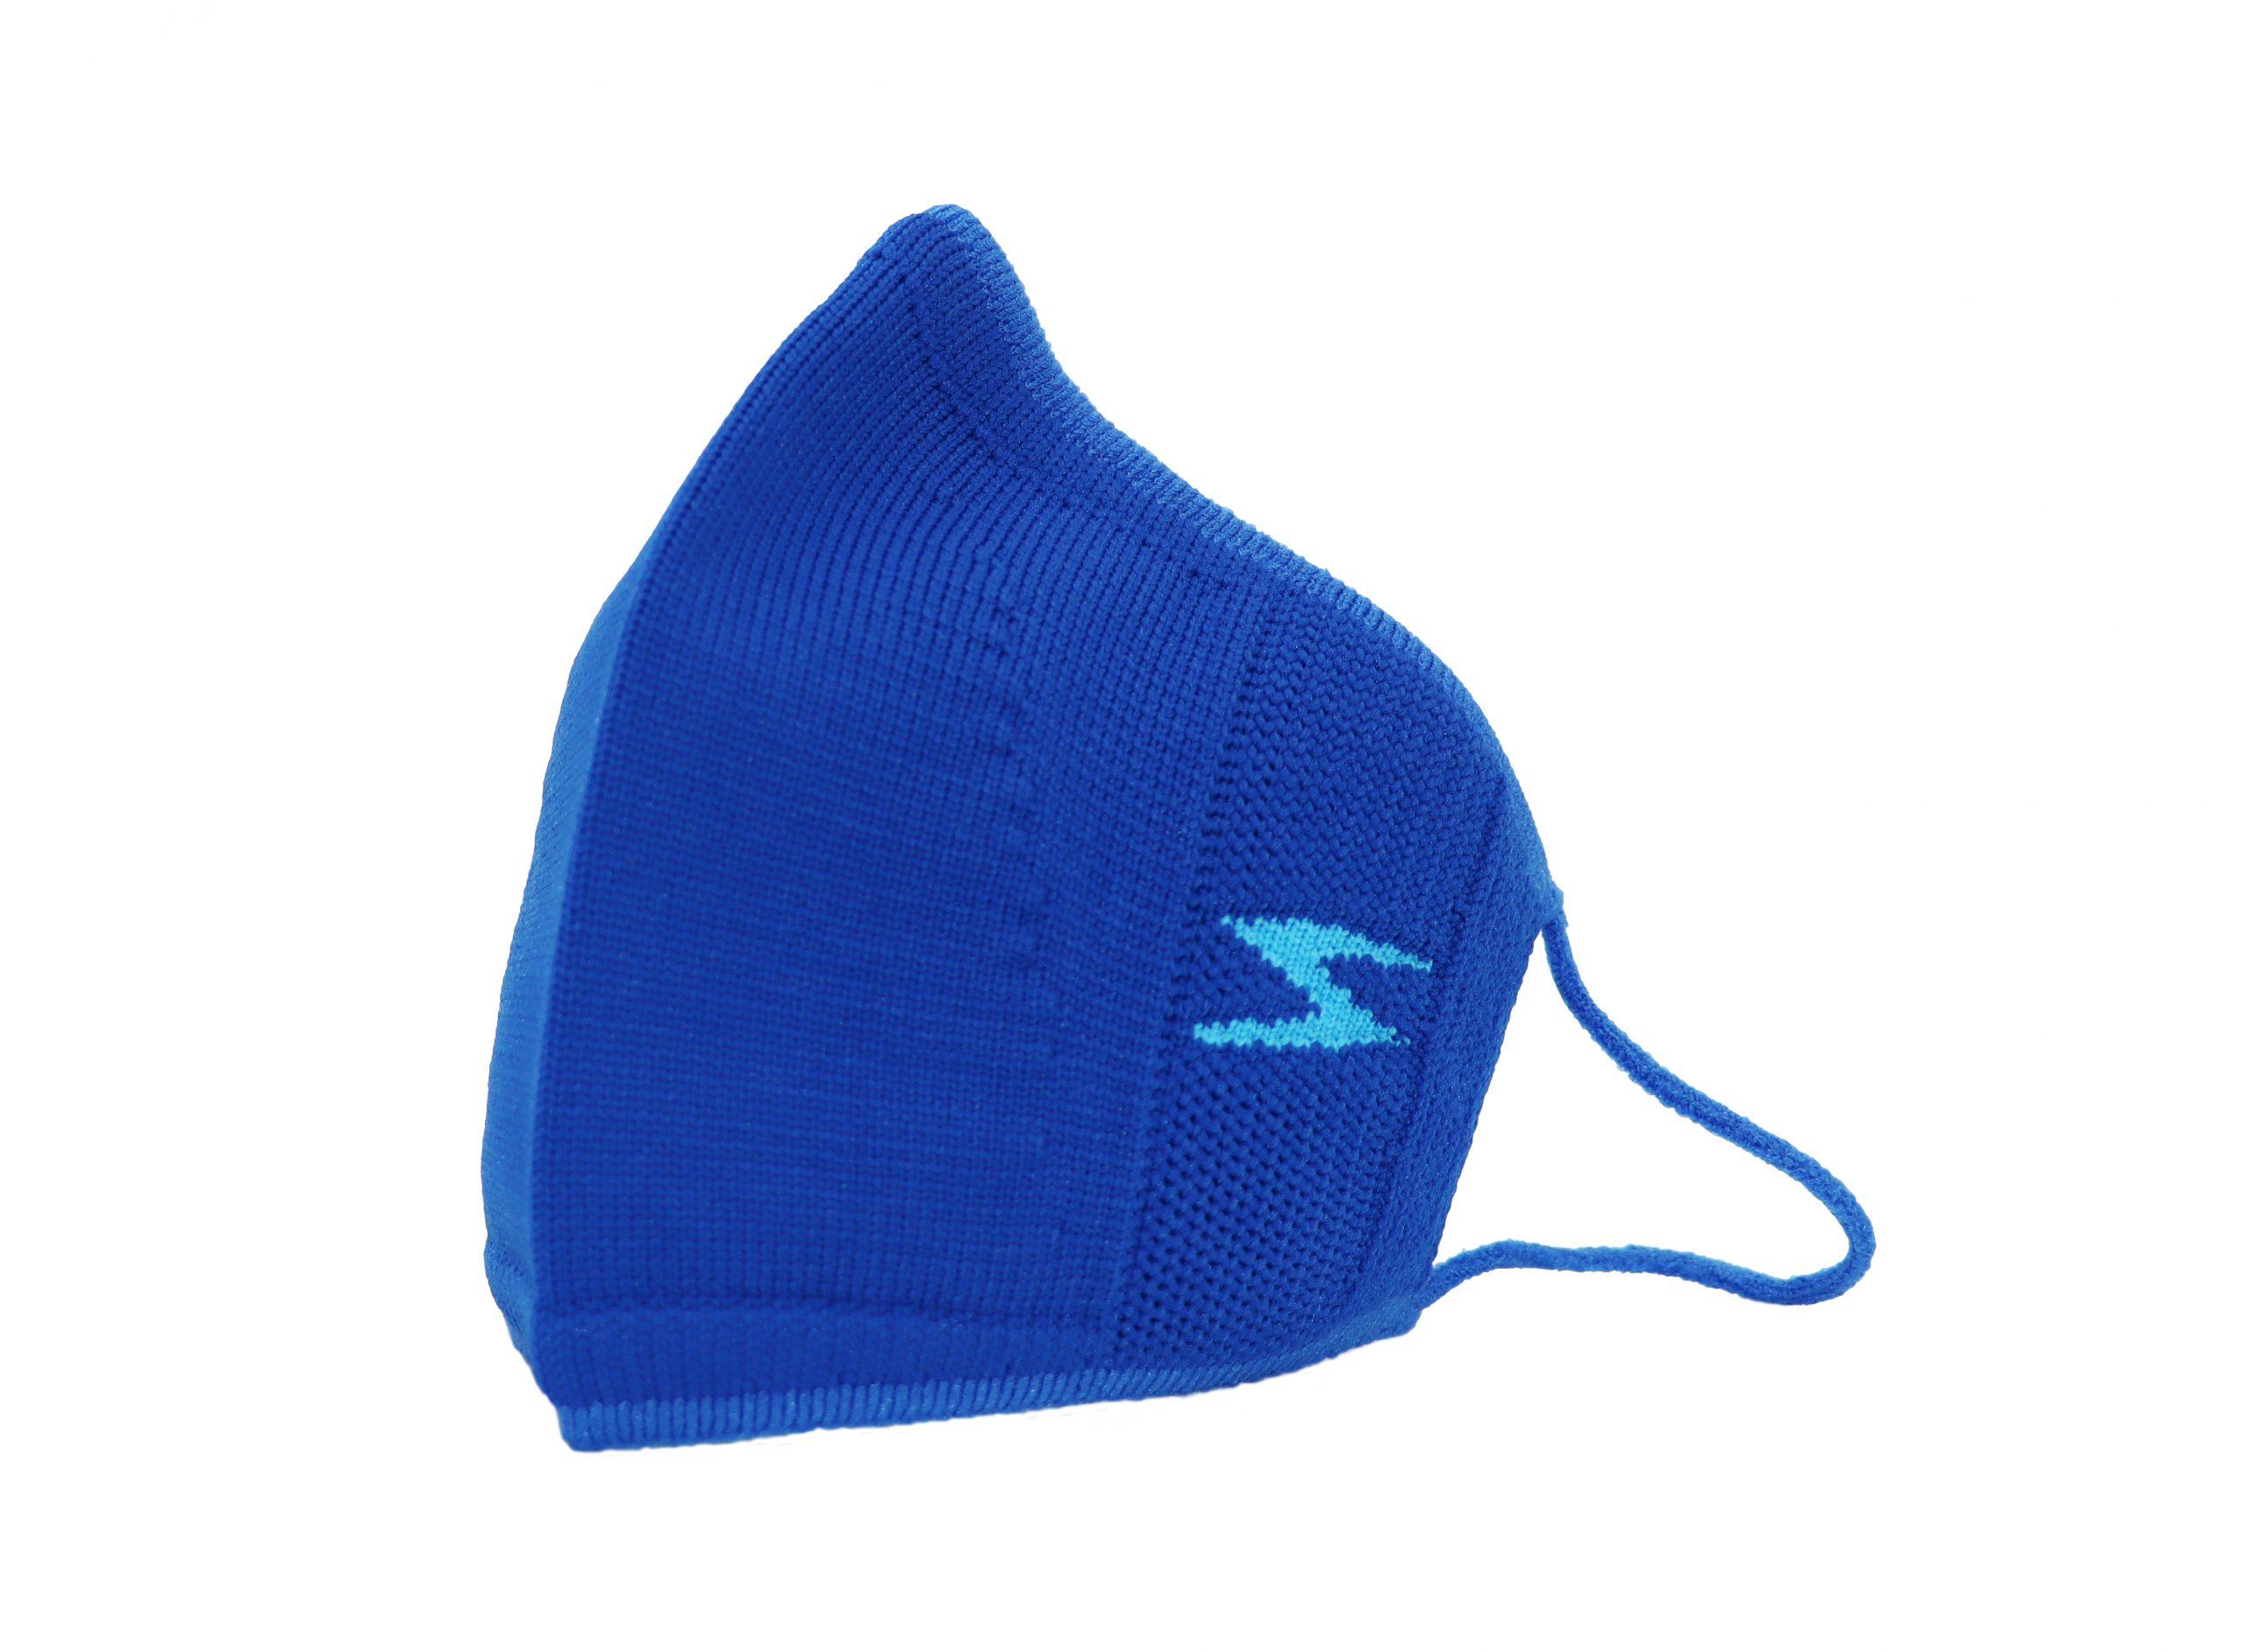 Pro-Mask reusable Kids Face Mask starter kit (Blue)